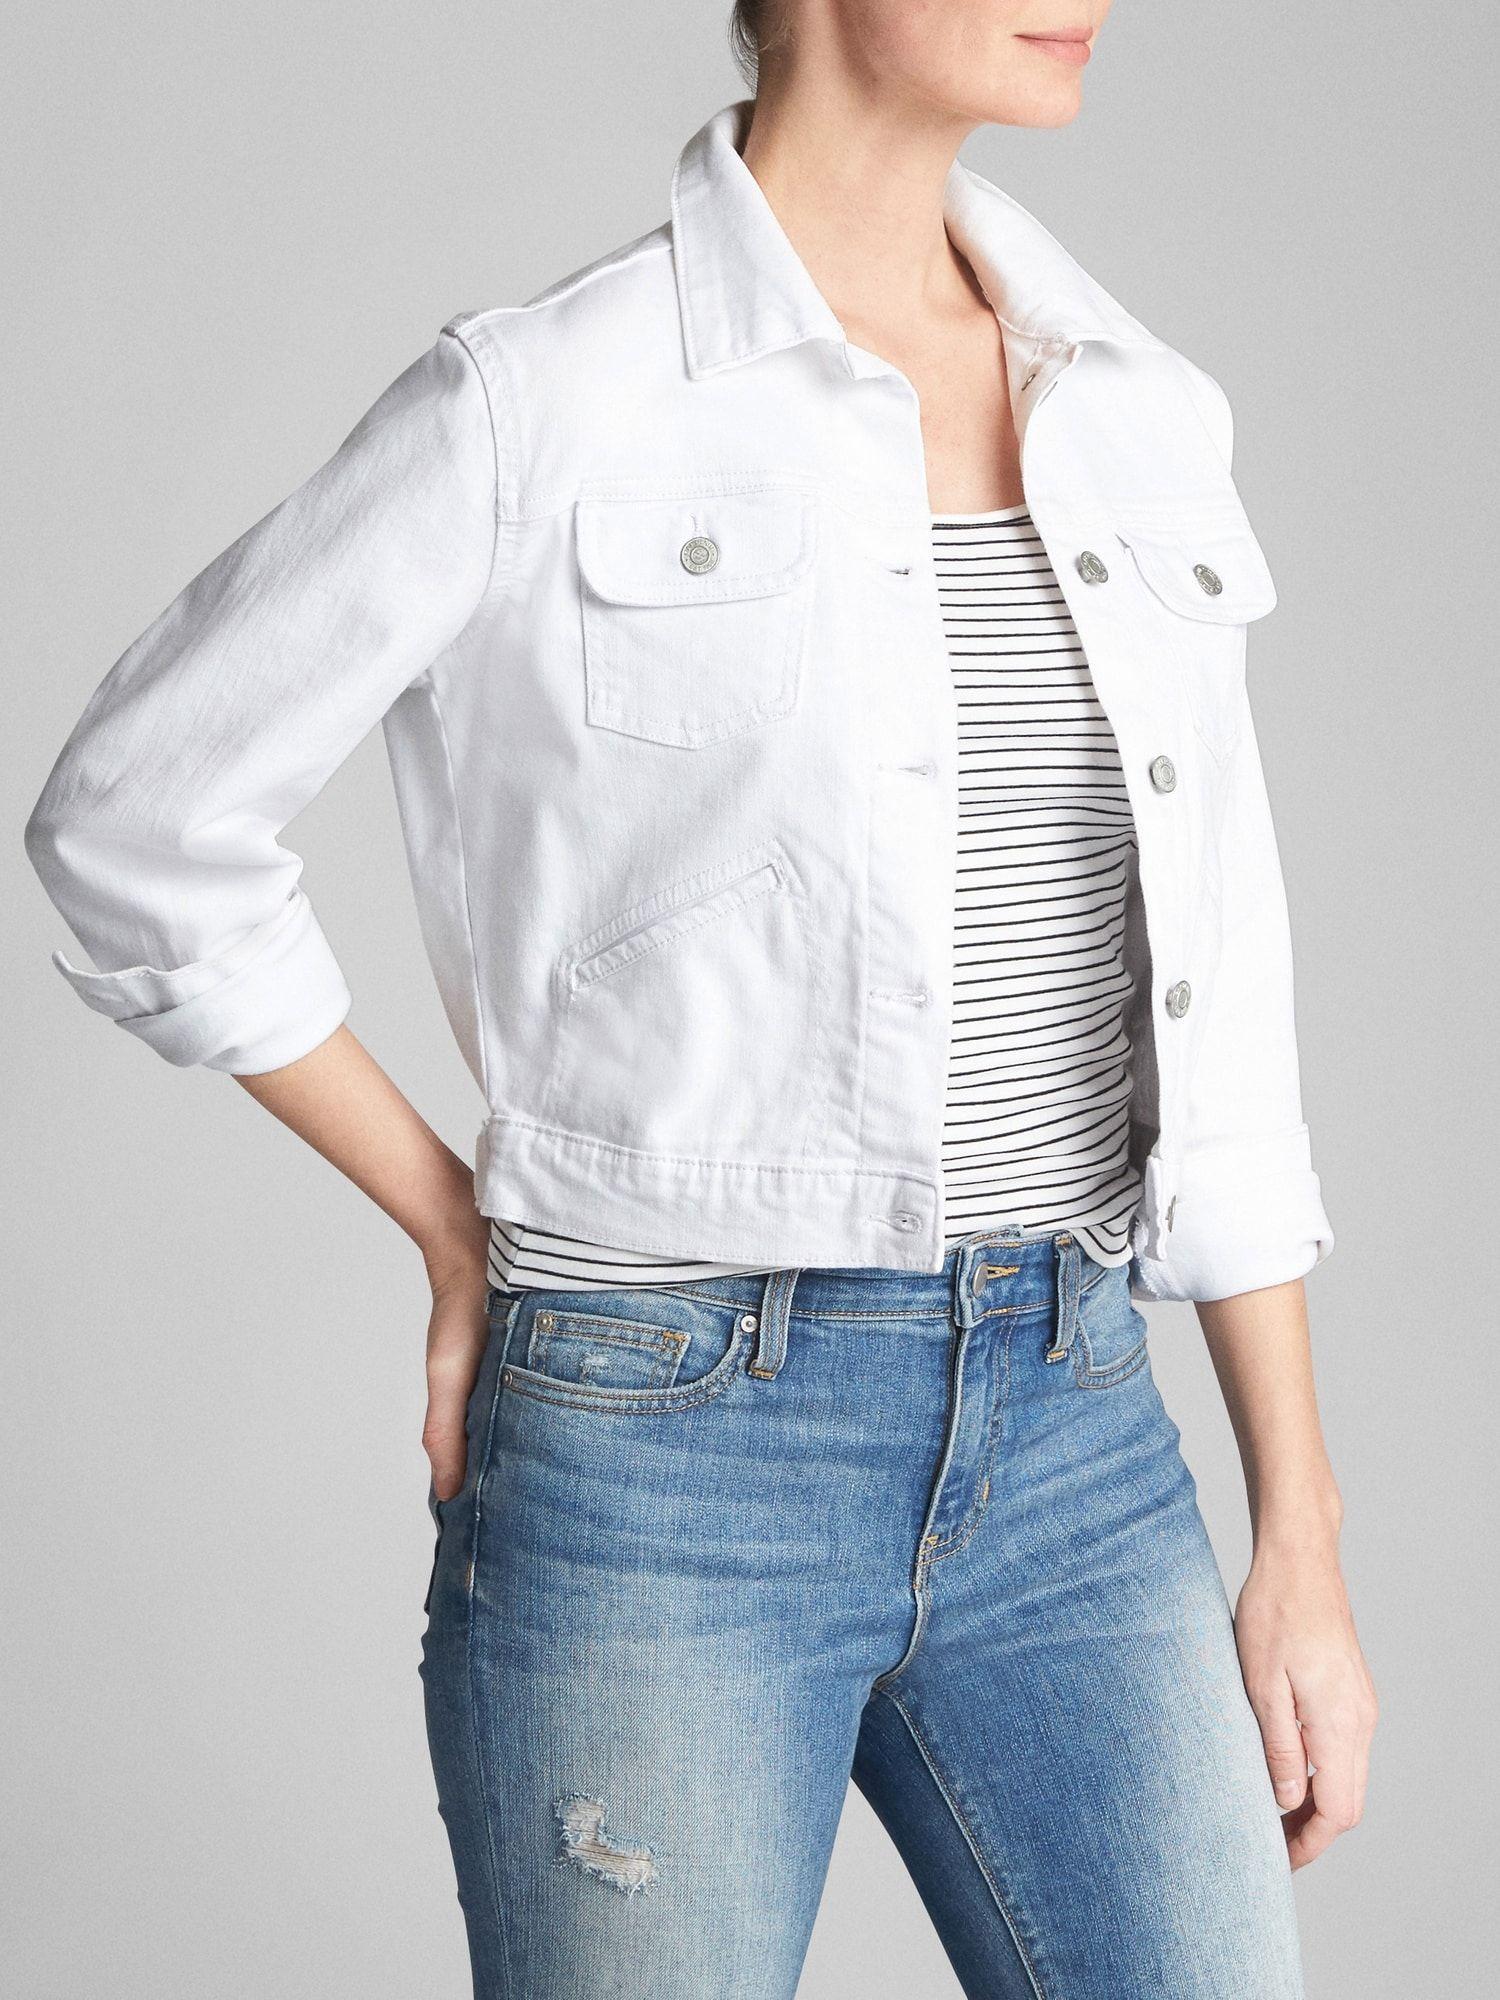 Crop White Denim Jacket Gap Factory Denim Fashion Women Jacket Outfit Women Casual Style Outfits [ 2000 x 1500 Pixel ]